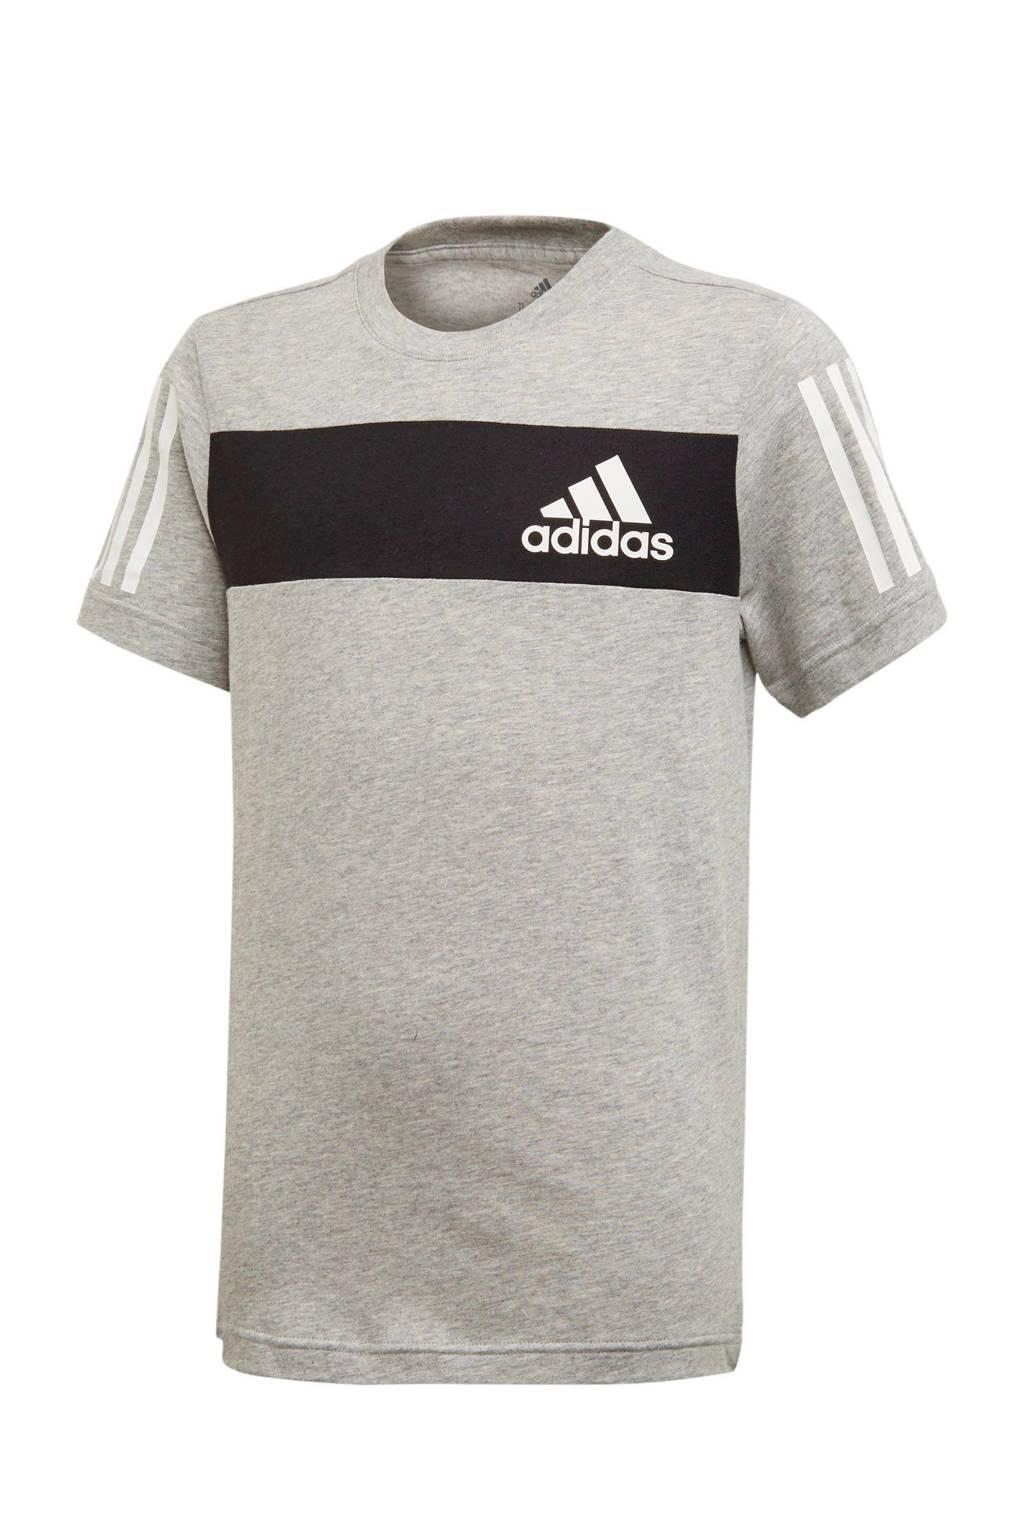 adidas   sport T-shirt grijs melange, Grijs melange/zwart